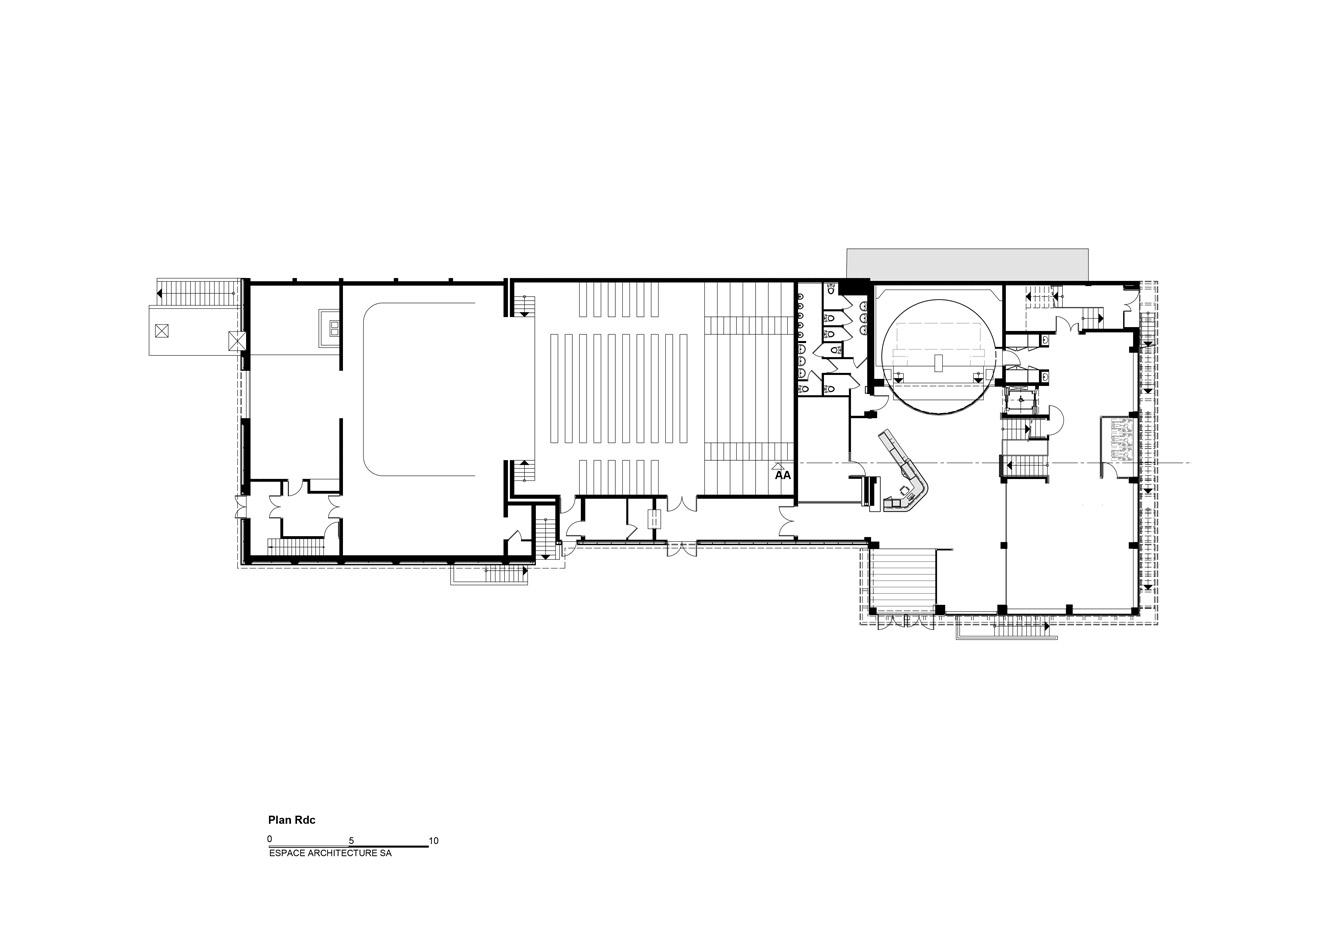 Mediatheque-Freyming_Plan-RdC